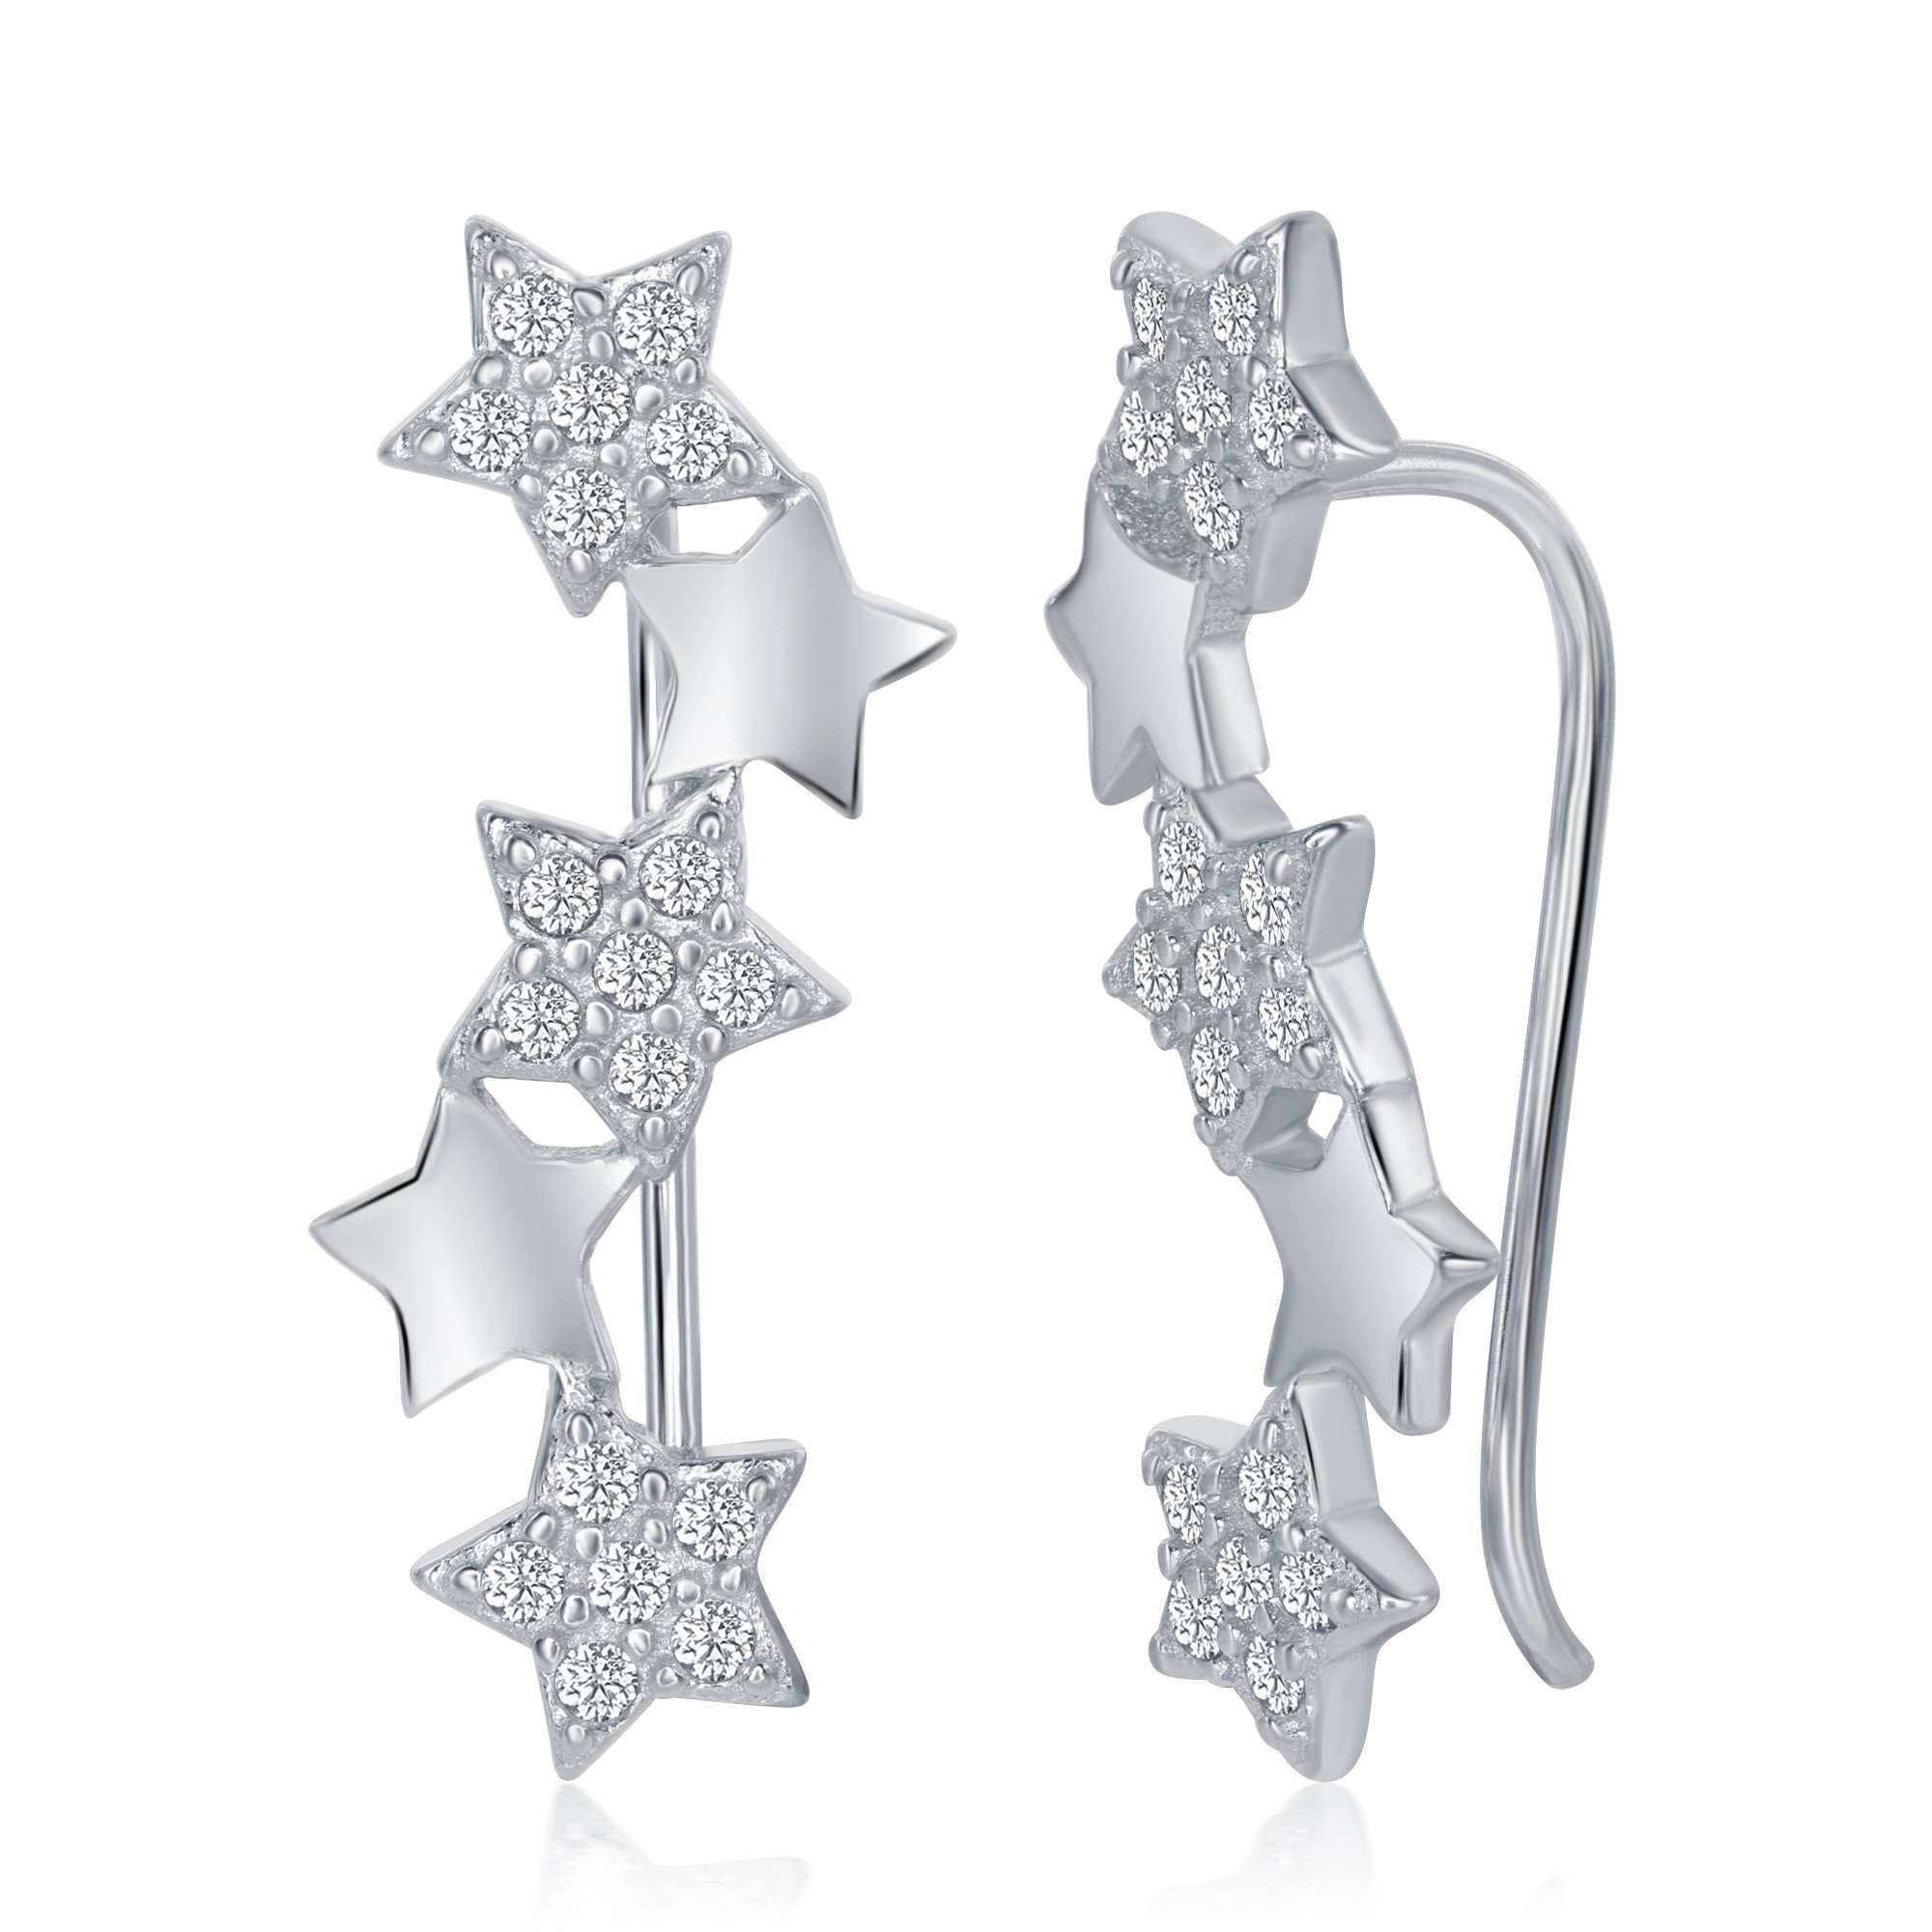 Sterling Silver 925 Cubic Zirconia Womens Ladies Girls Ear Pin Crawler Climber Stars Earrings